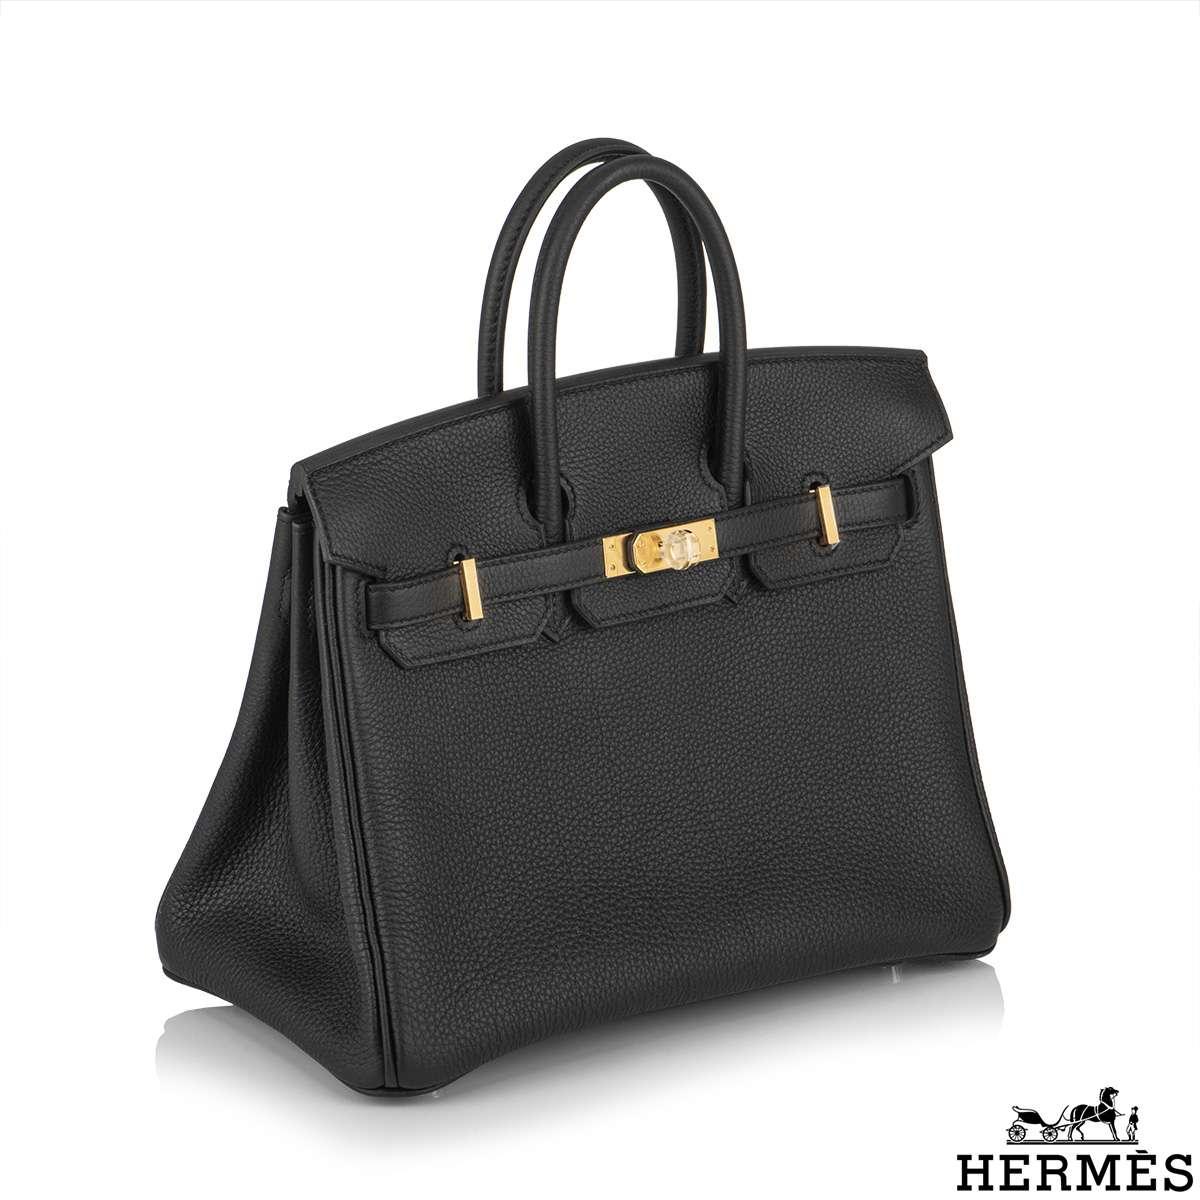 Hermès Black Togo Birkin 25cm GHW